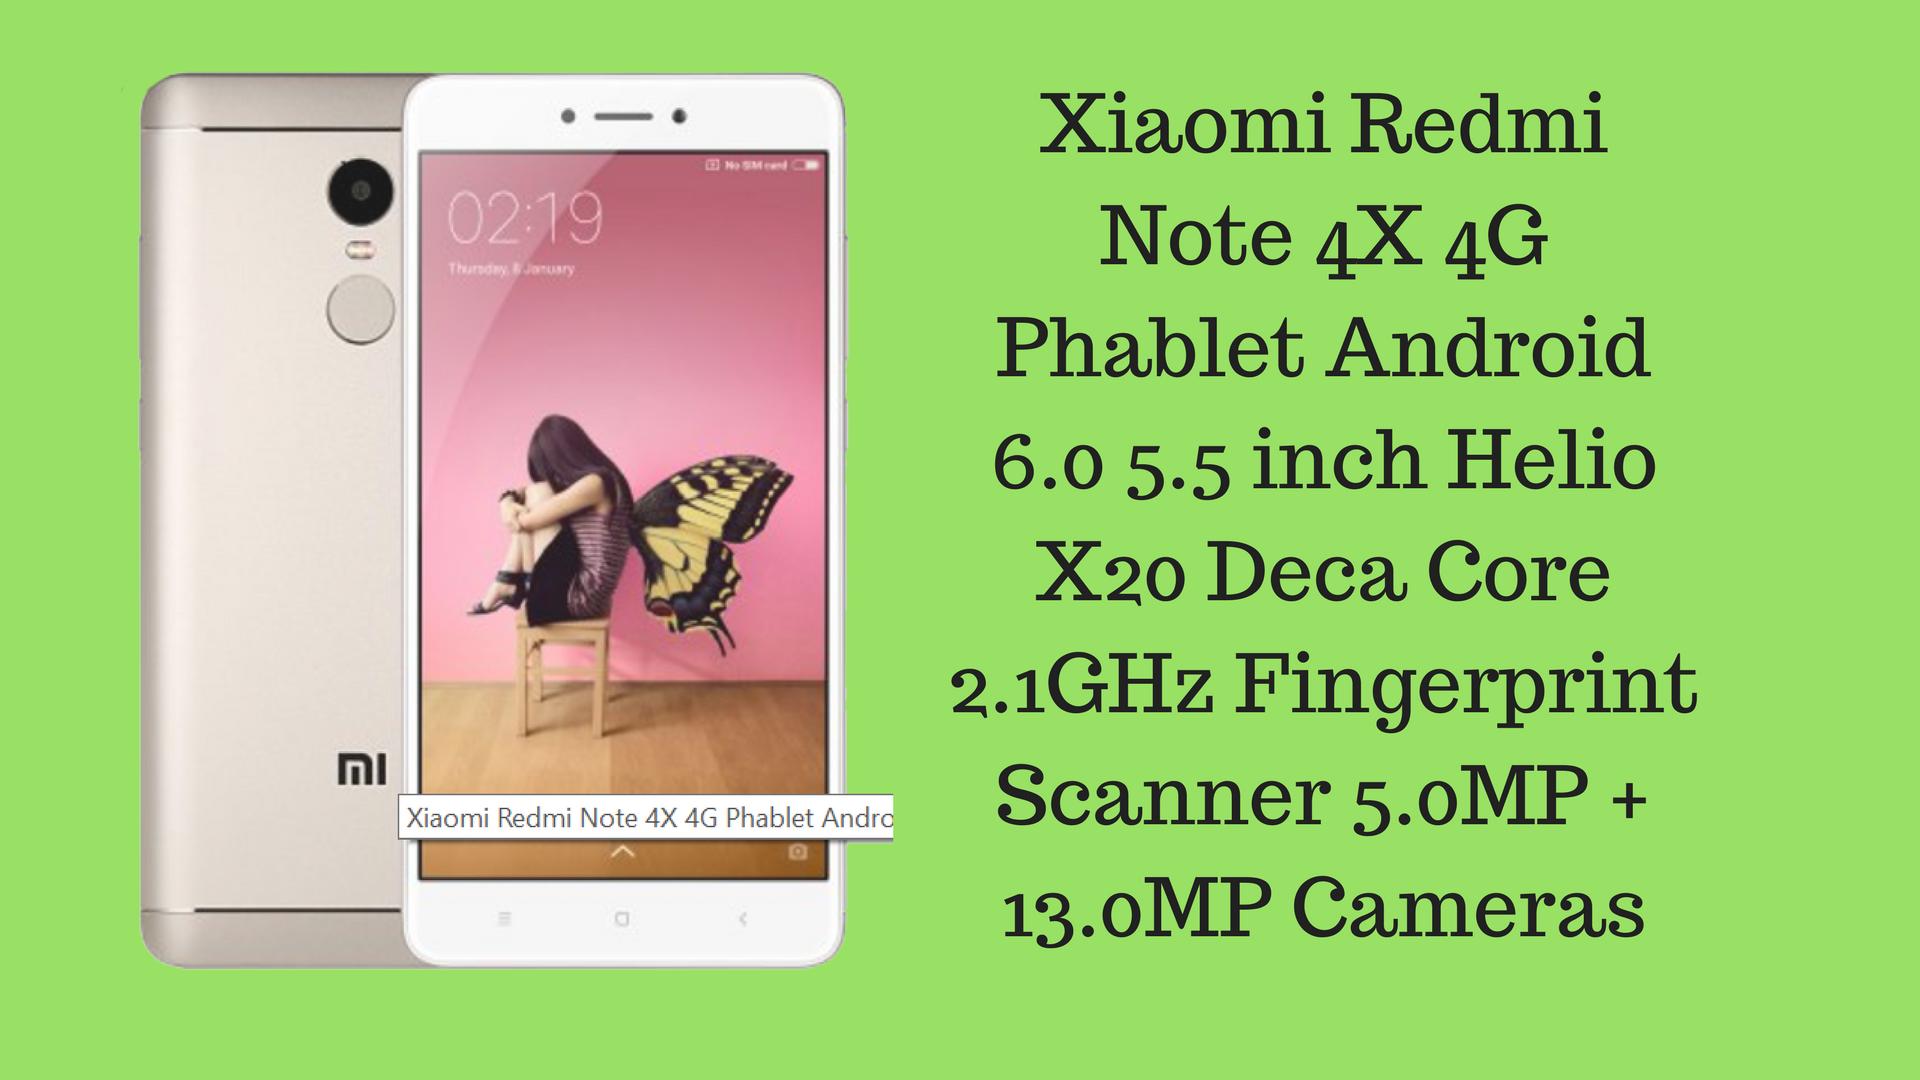 Buy Xiaomi Redmi Note 4 4 Gb Ram 64 Gb Rom Mobile: Xiaomi Redmi Note 4X 4G Phablet 4GB RAM 64GB ROM